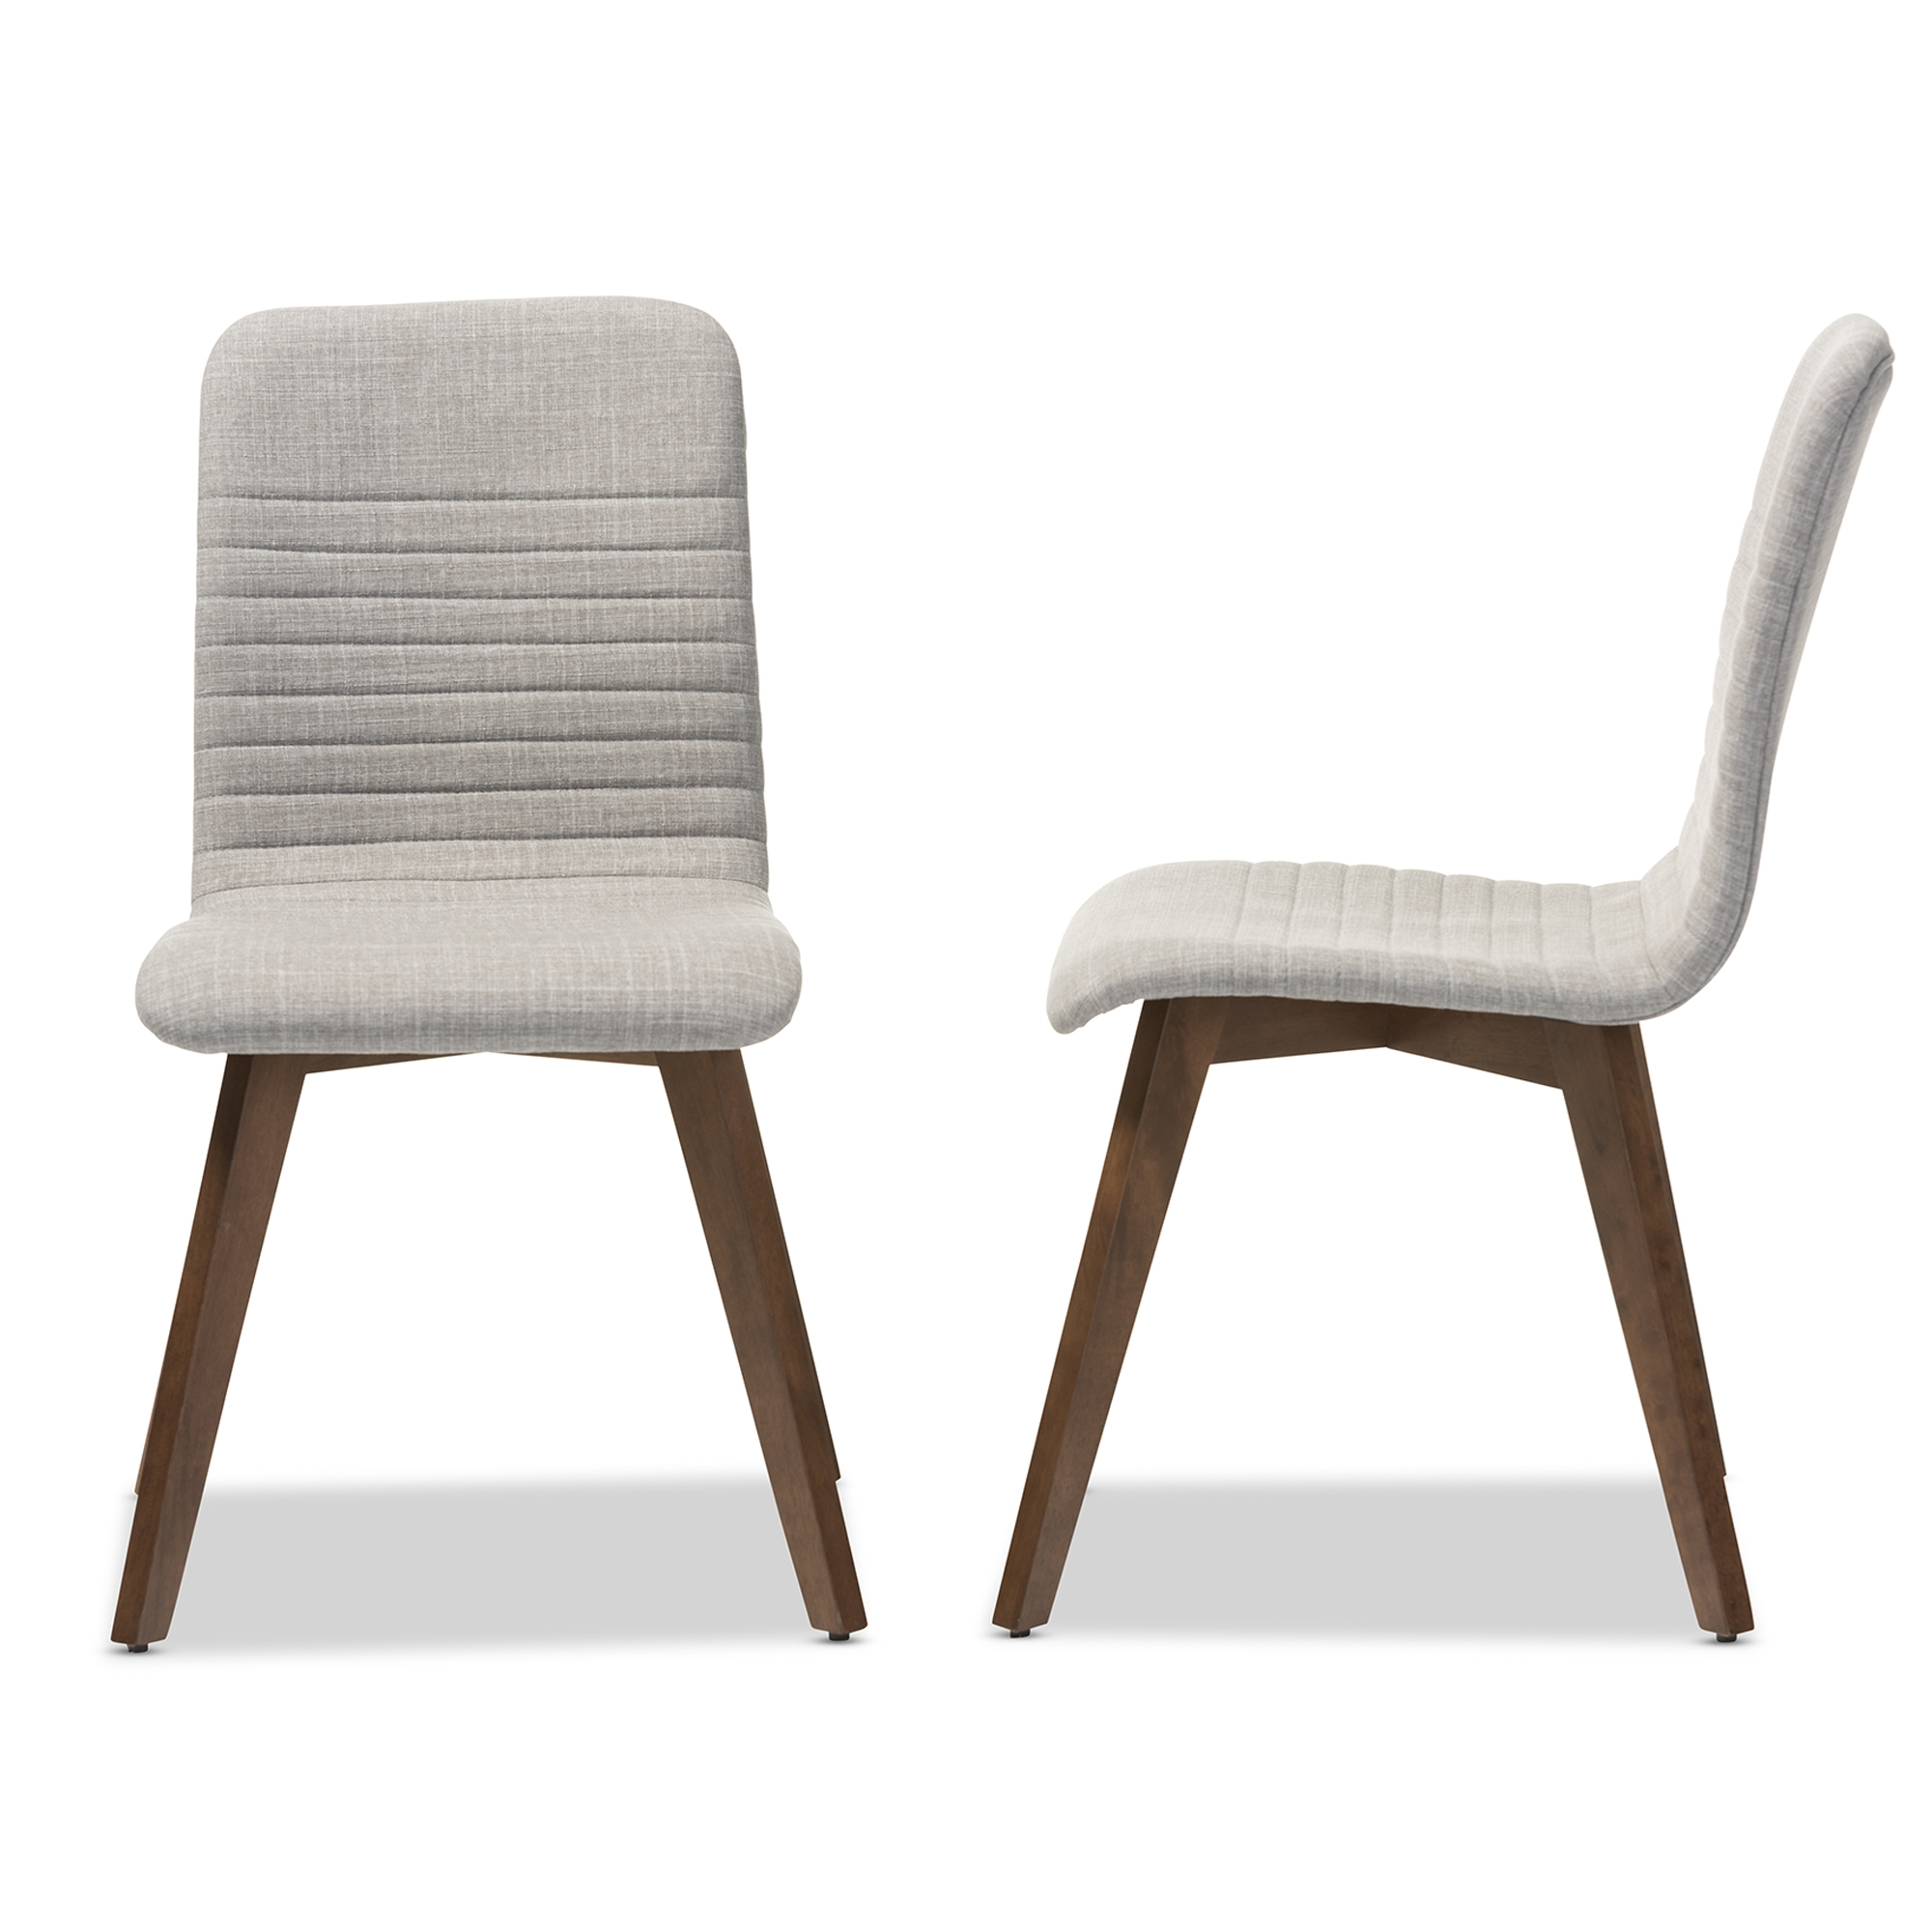 ... Dining Chairs U003e Wholesale Wood U003e. Baxton Studio Sugar Mid Century Retro  Modern Scandinavian Style Light Grey Fabric Upholstered Walnut Wood ...